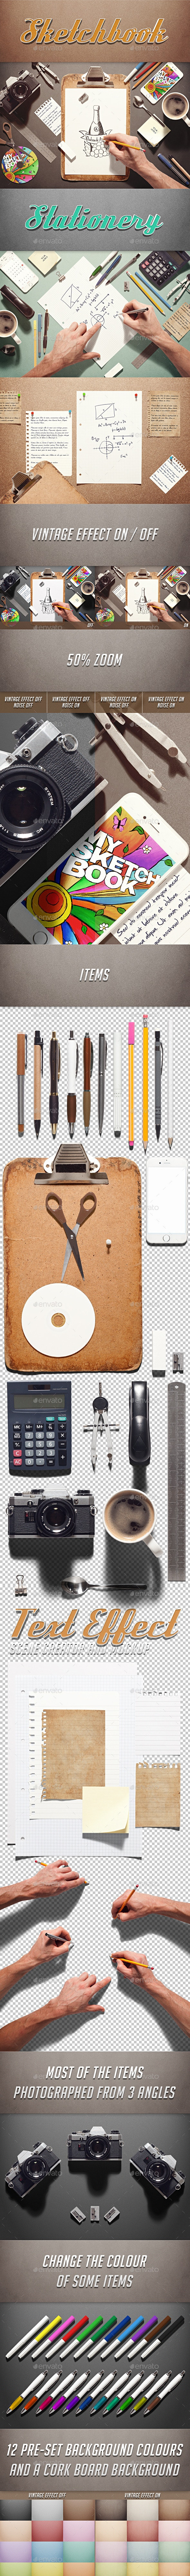 Sketchbook / Stationery Scene Creator - Hero Images Graphics